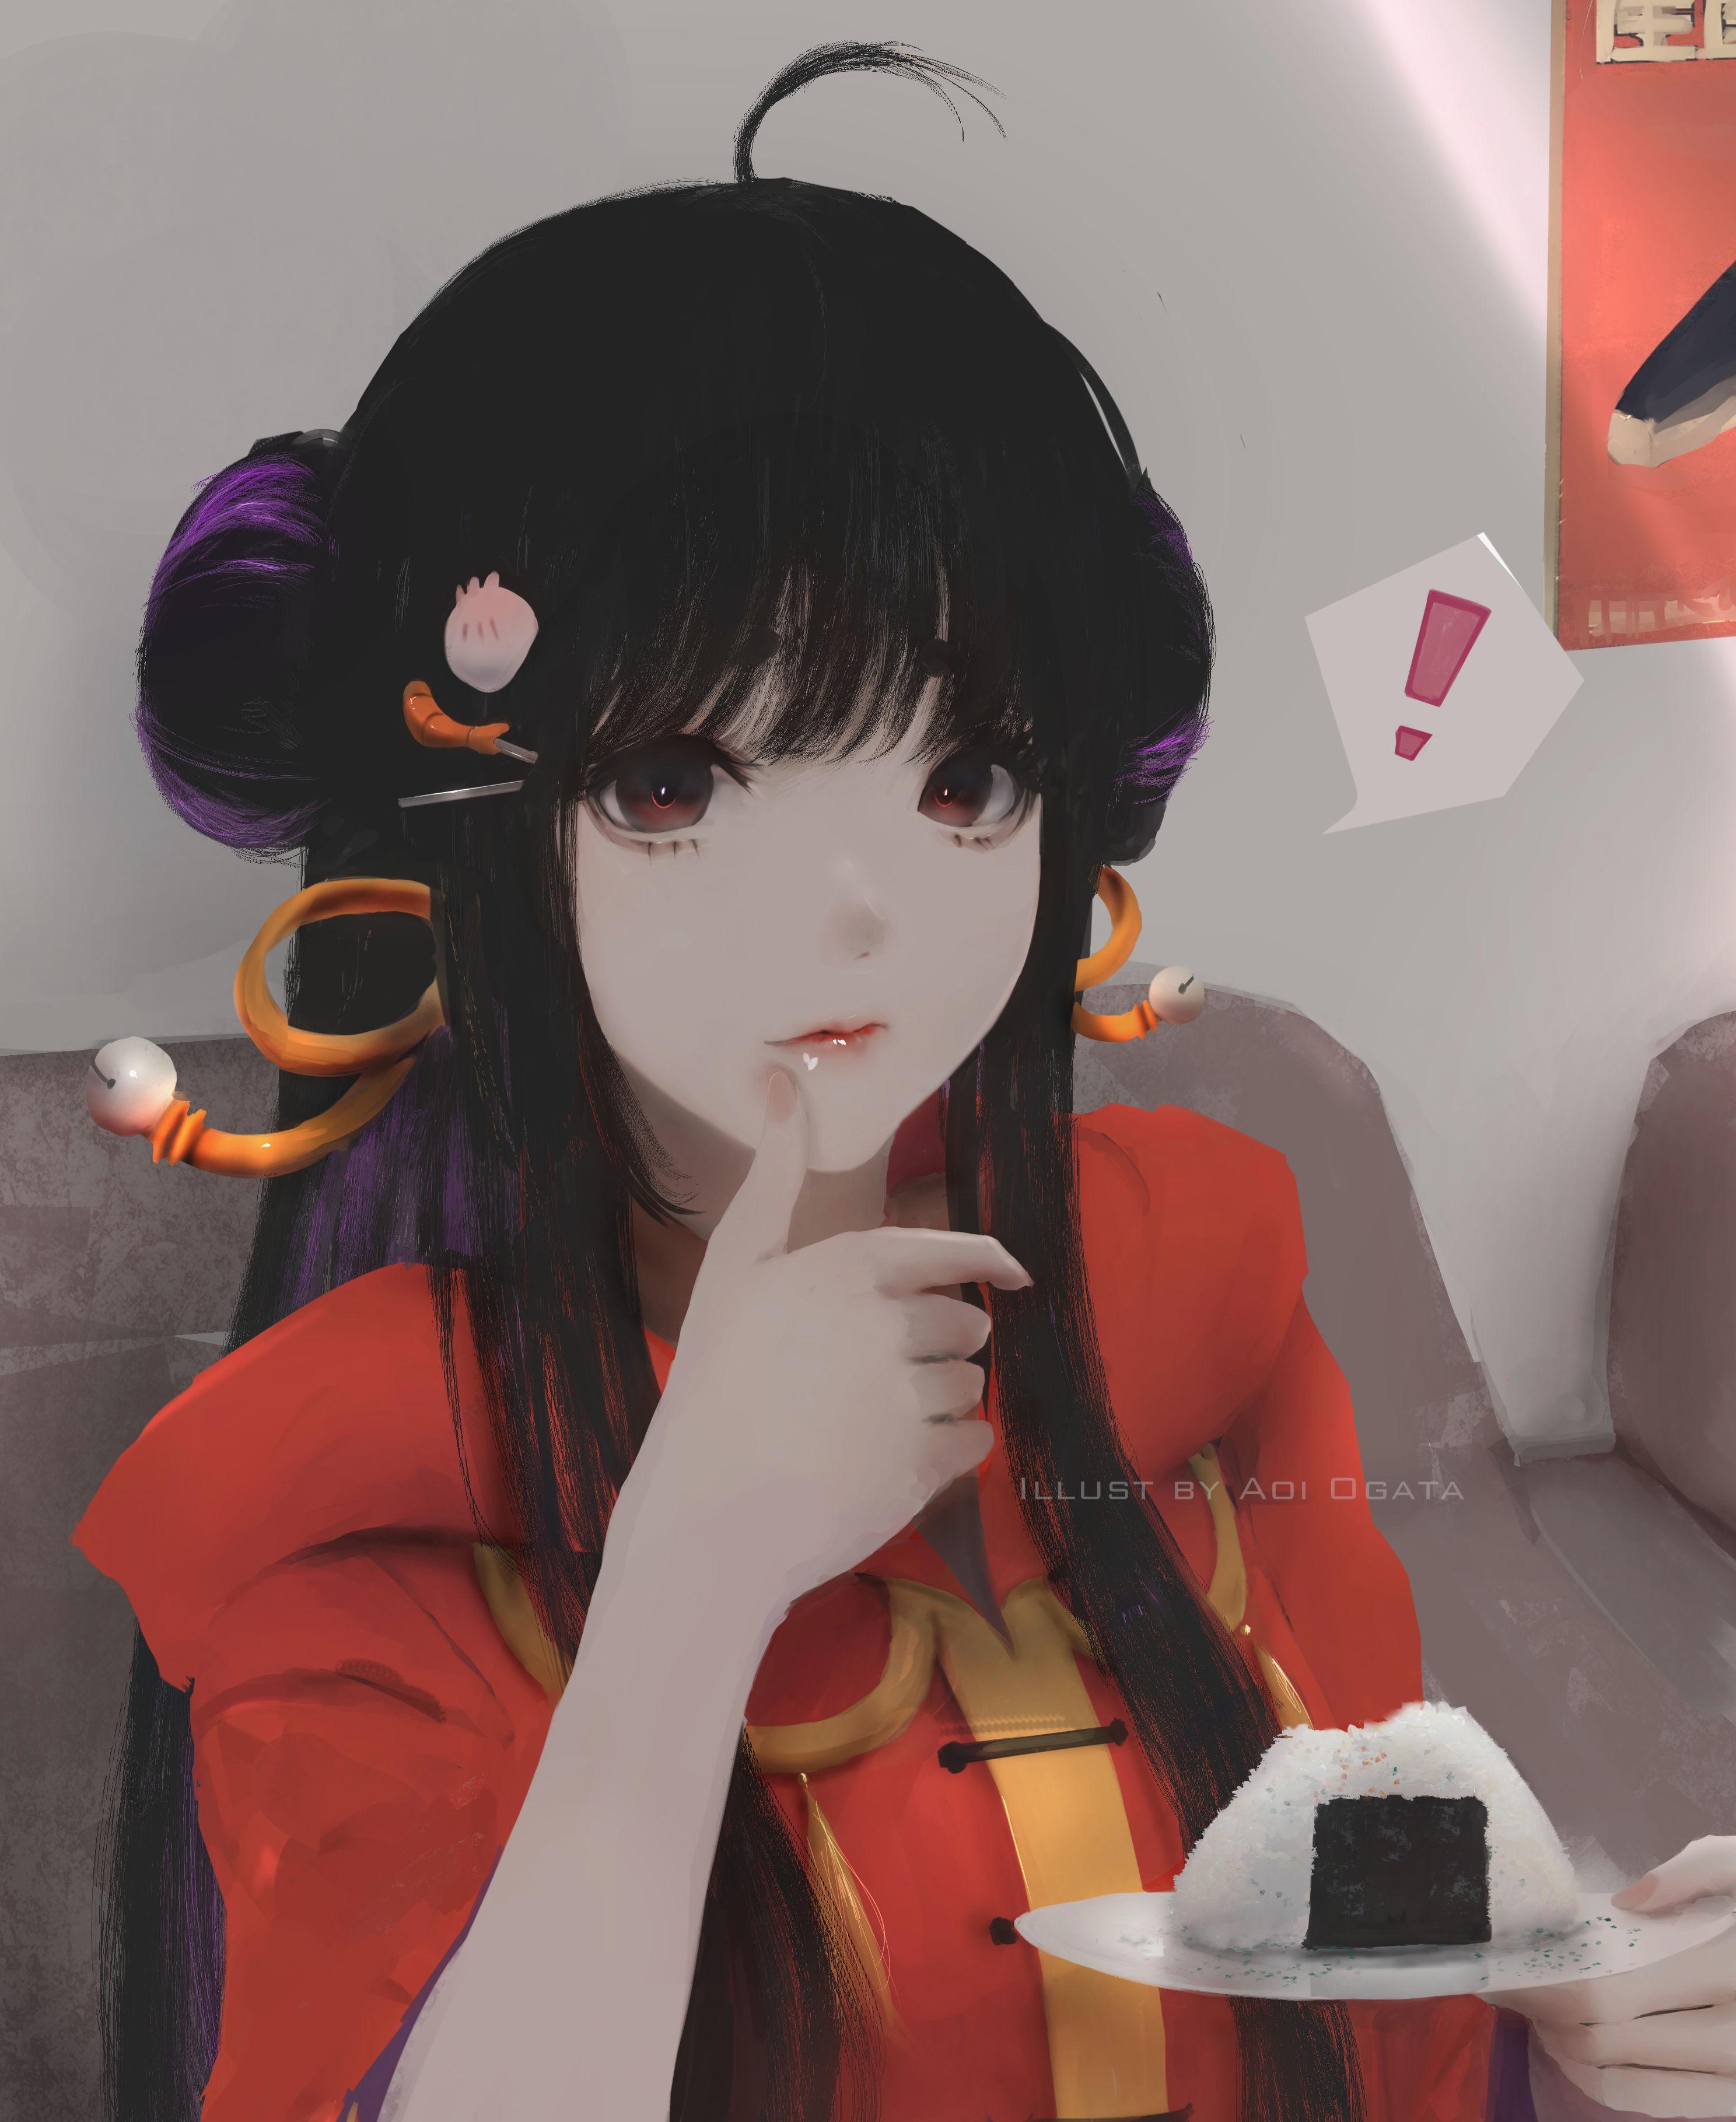 Aoi Ogata Image 2130064 Zerochan Anime Image Board